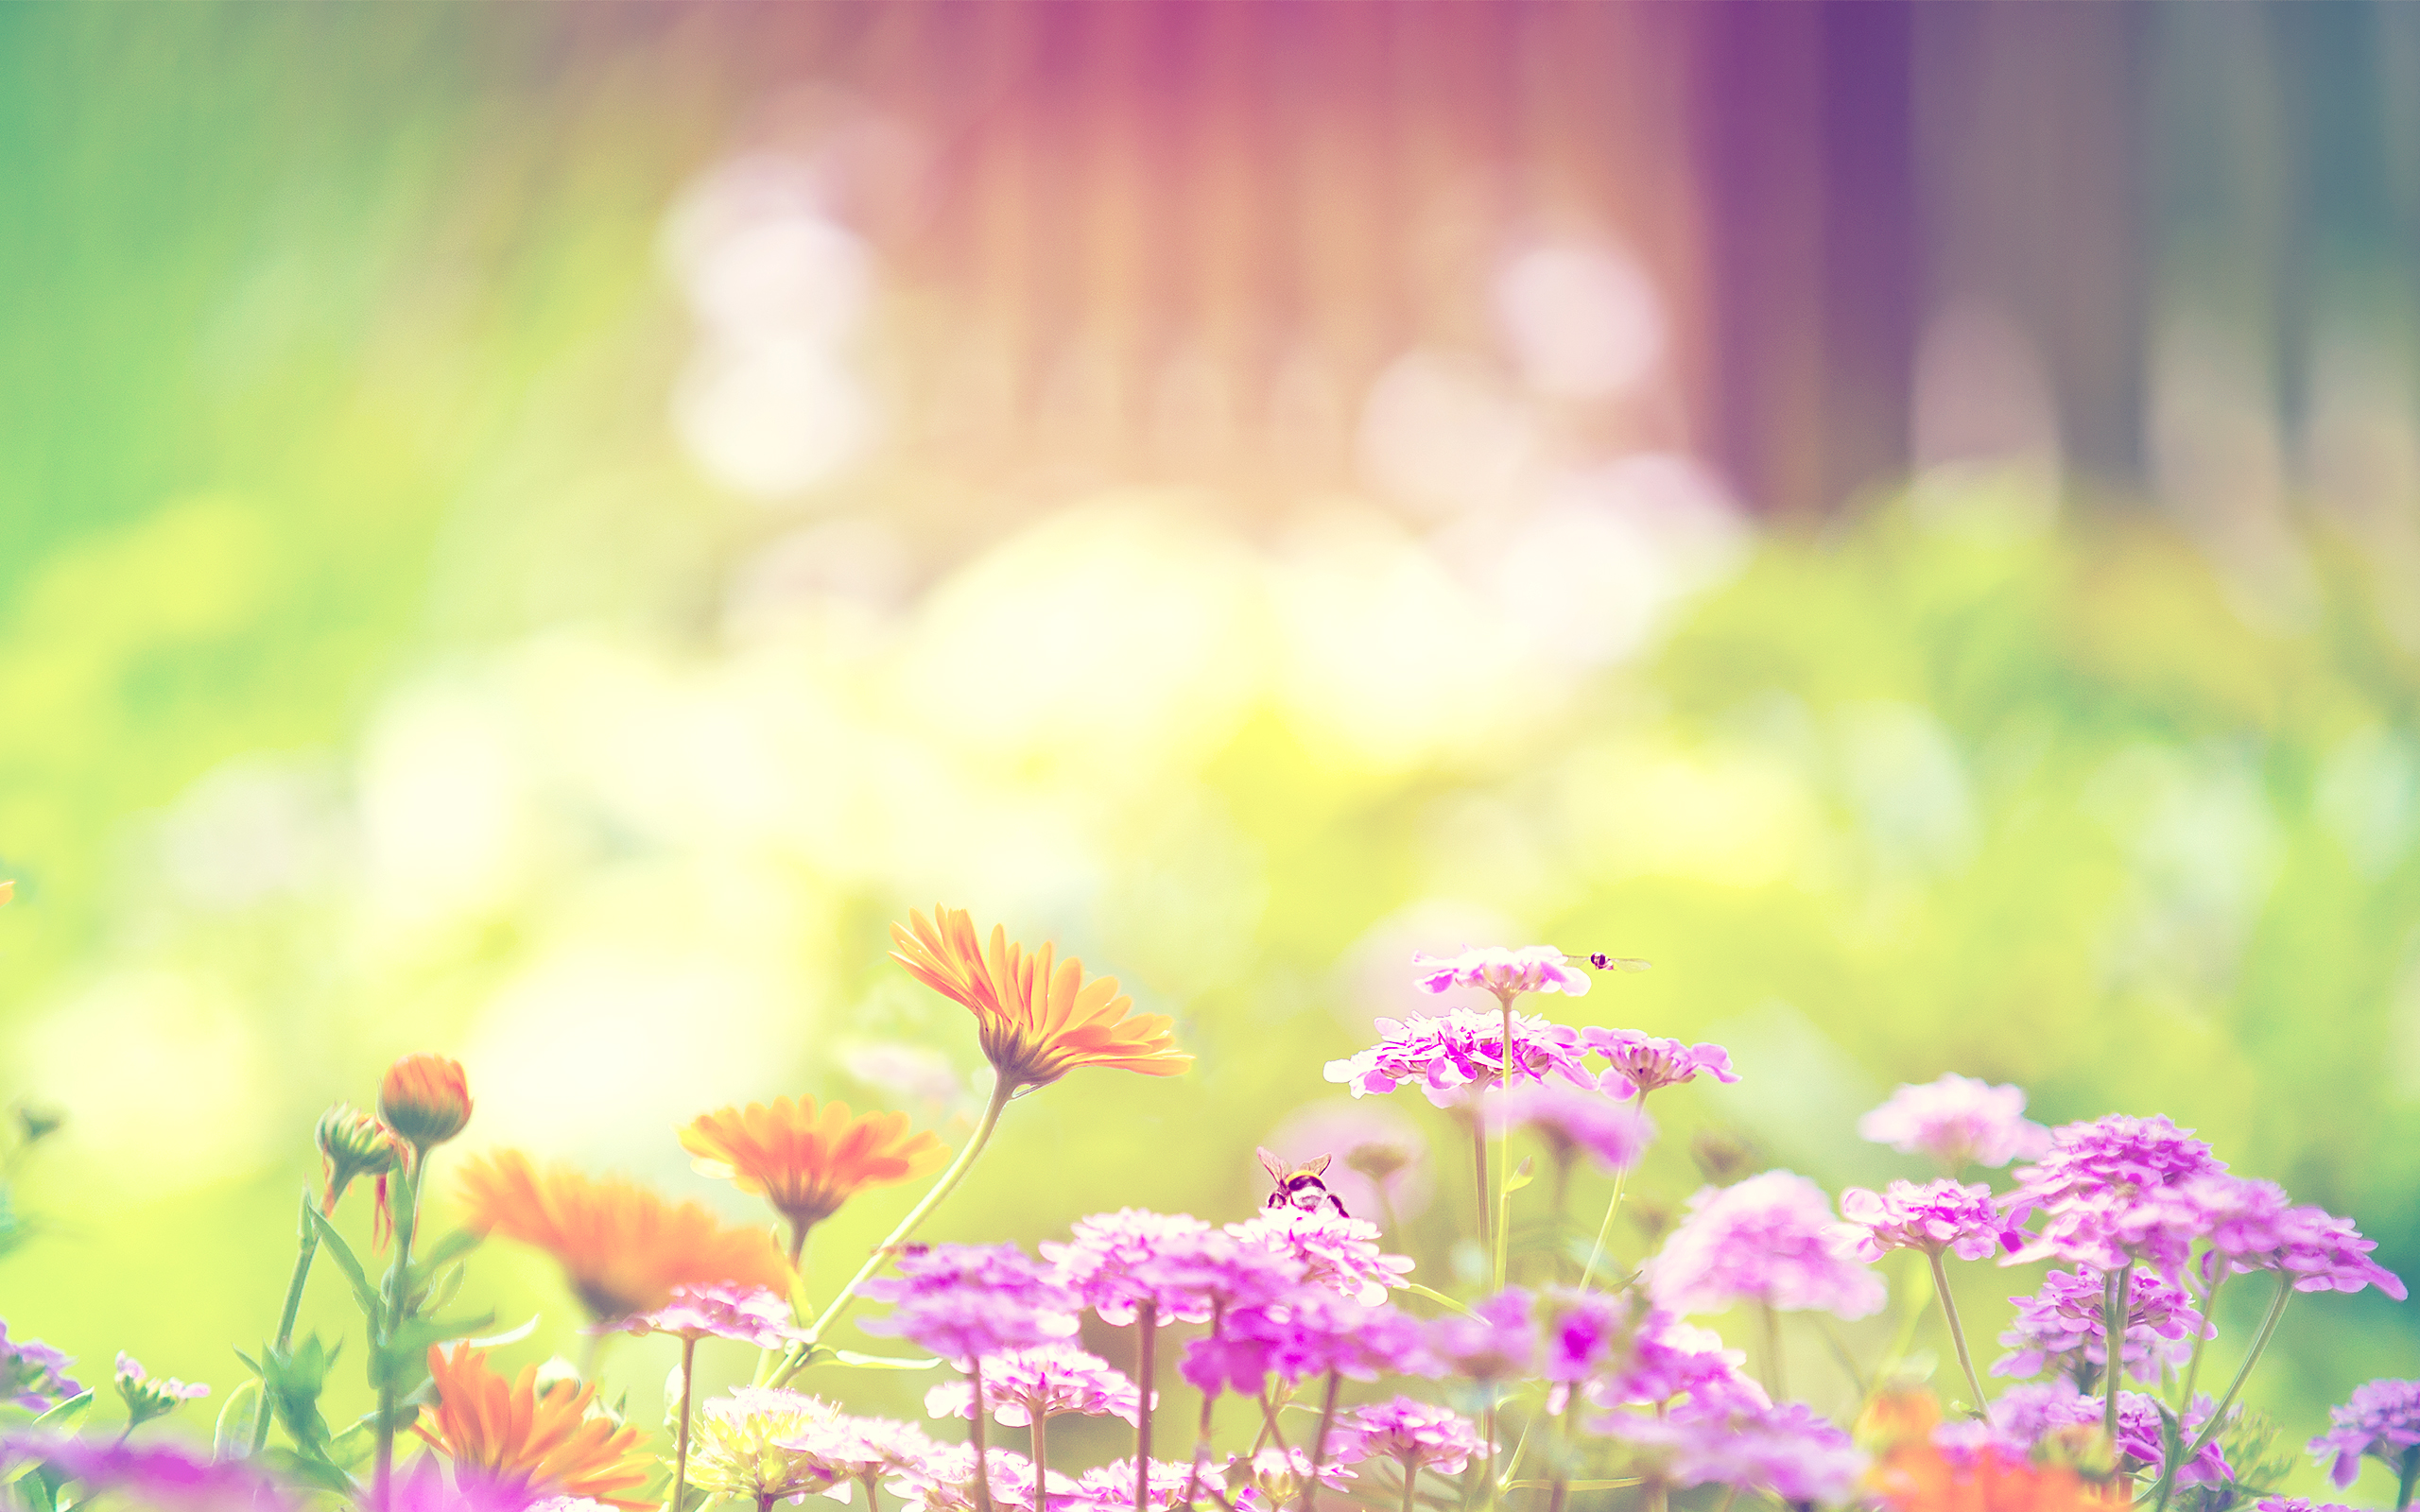 download Bright Spring Wallpaper 25620 Baltana [2560x1600 2560x1600